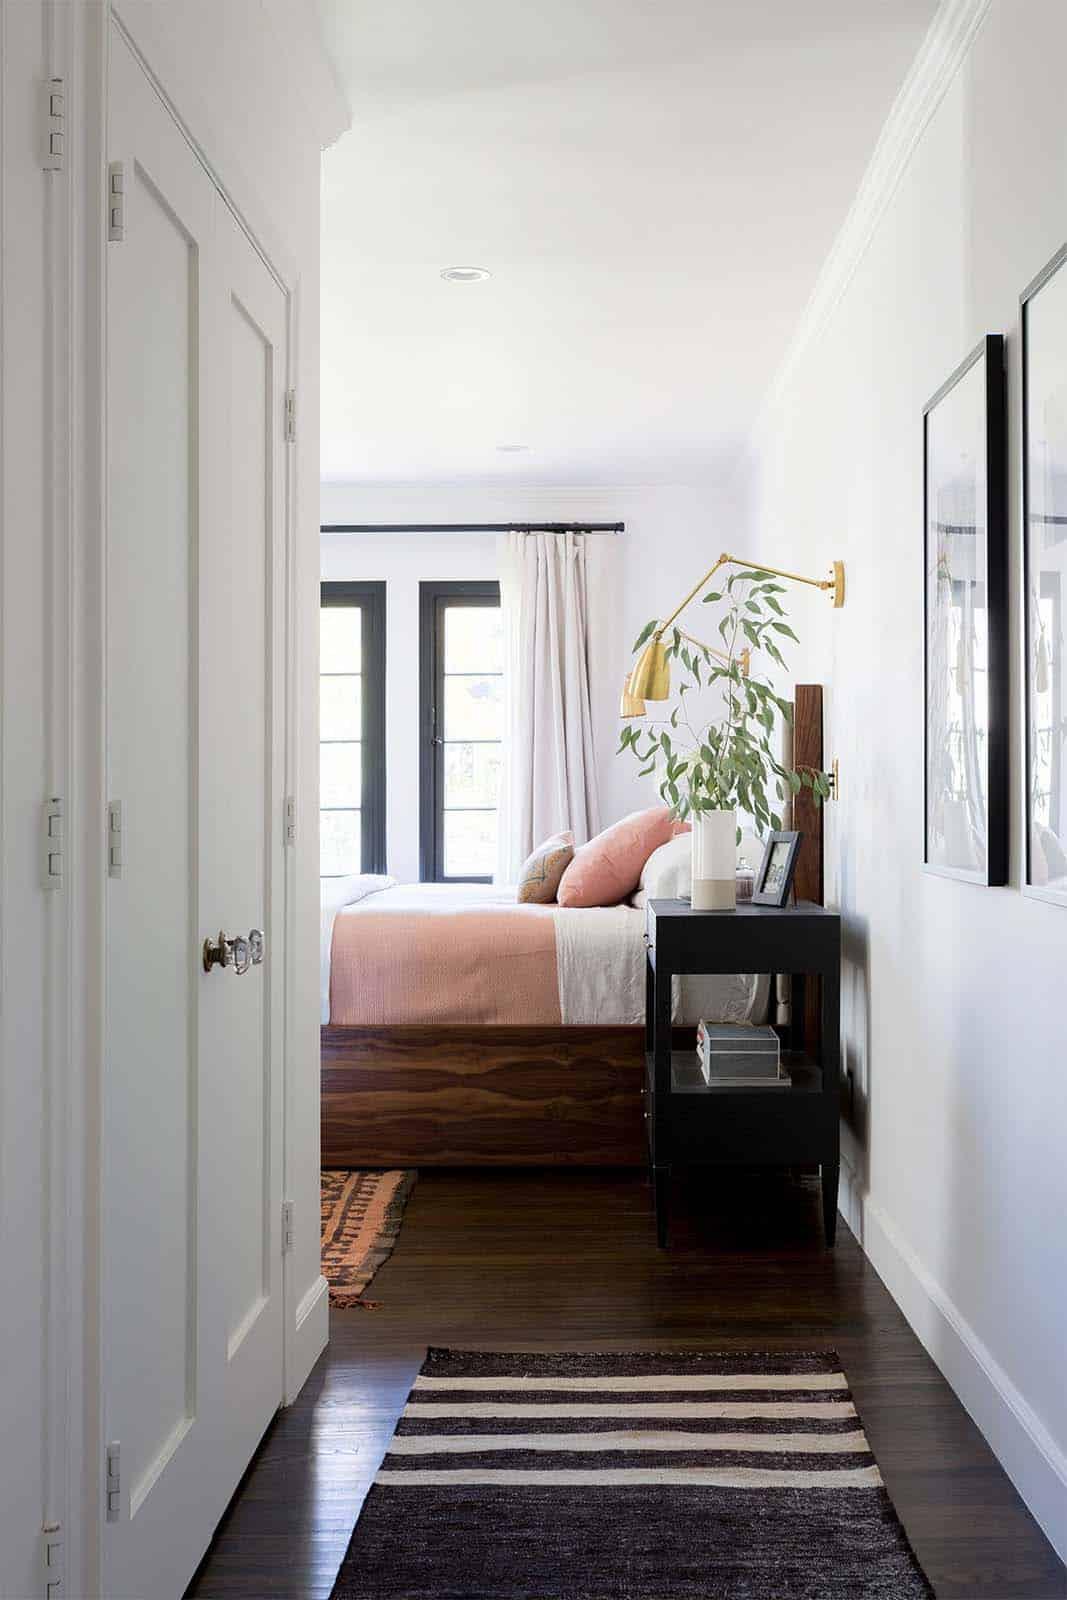 Style espagnol Home-Jette Creative-13-1 Kindesign